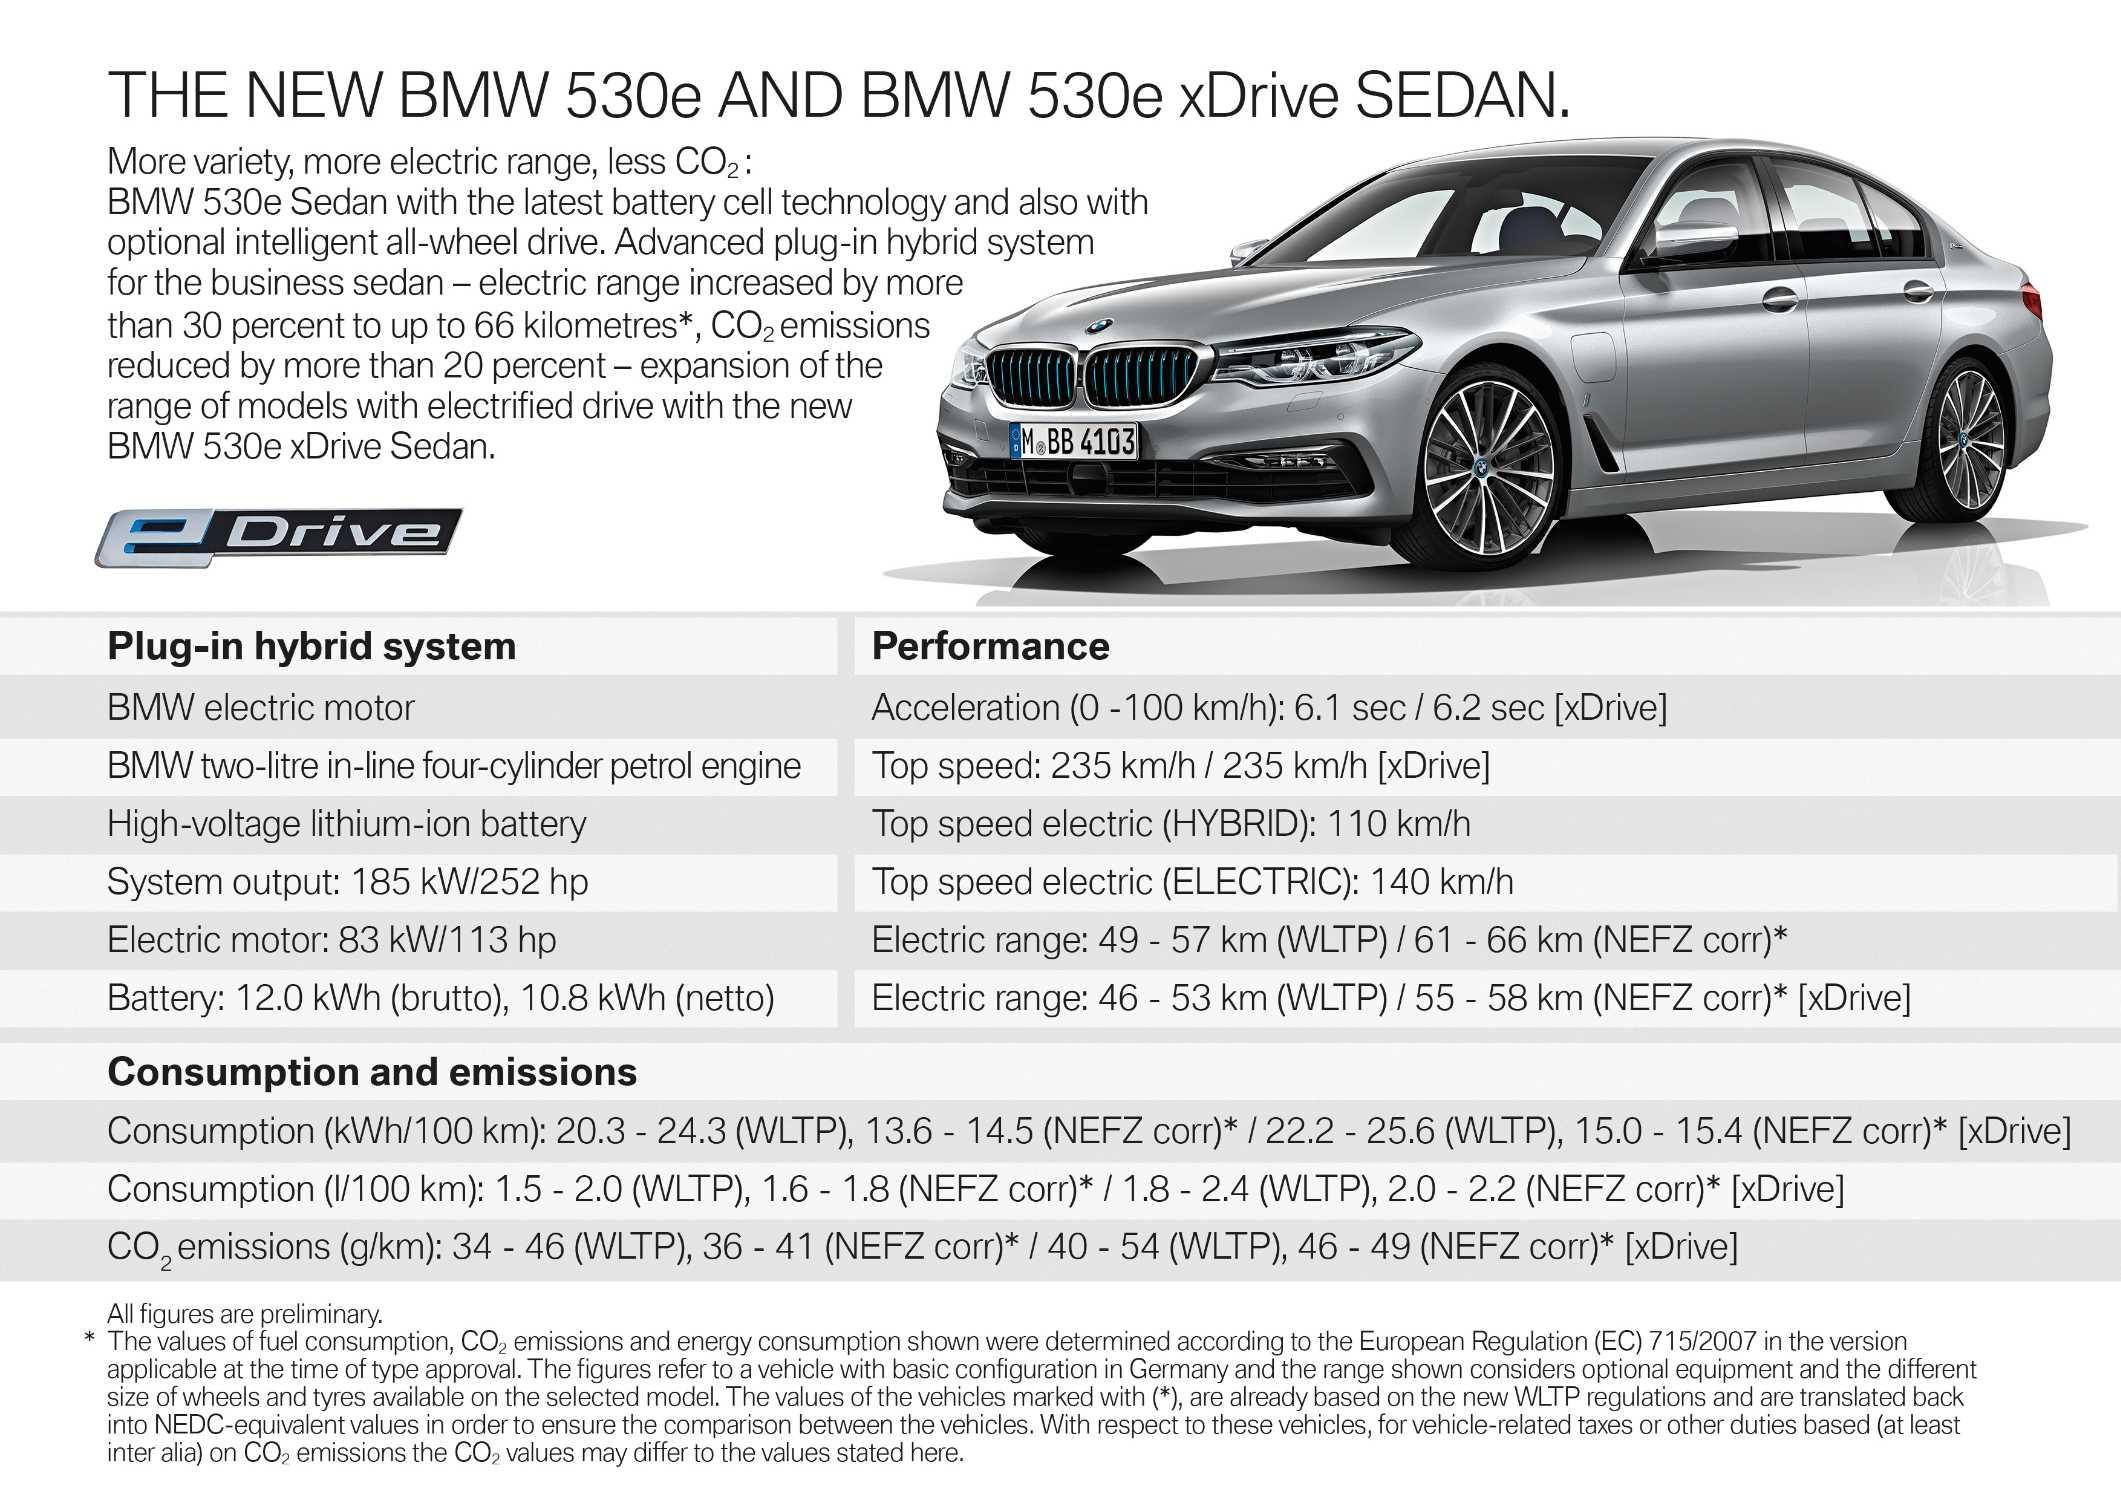 The new BMW 530e Sedan (08/2019).